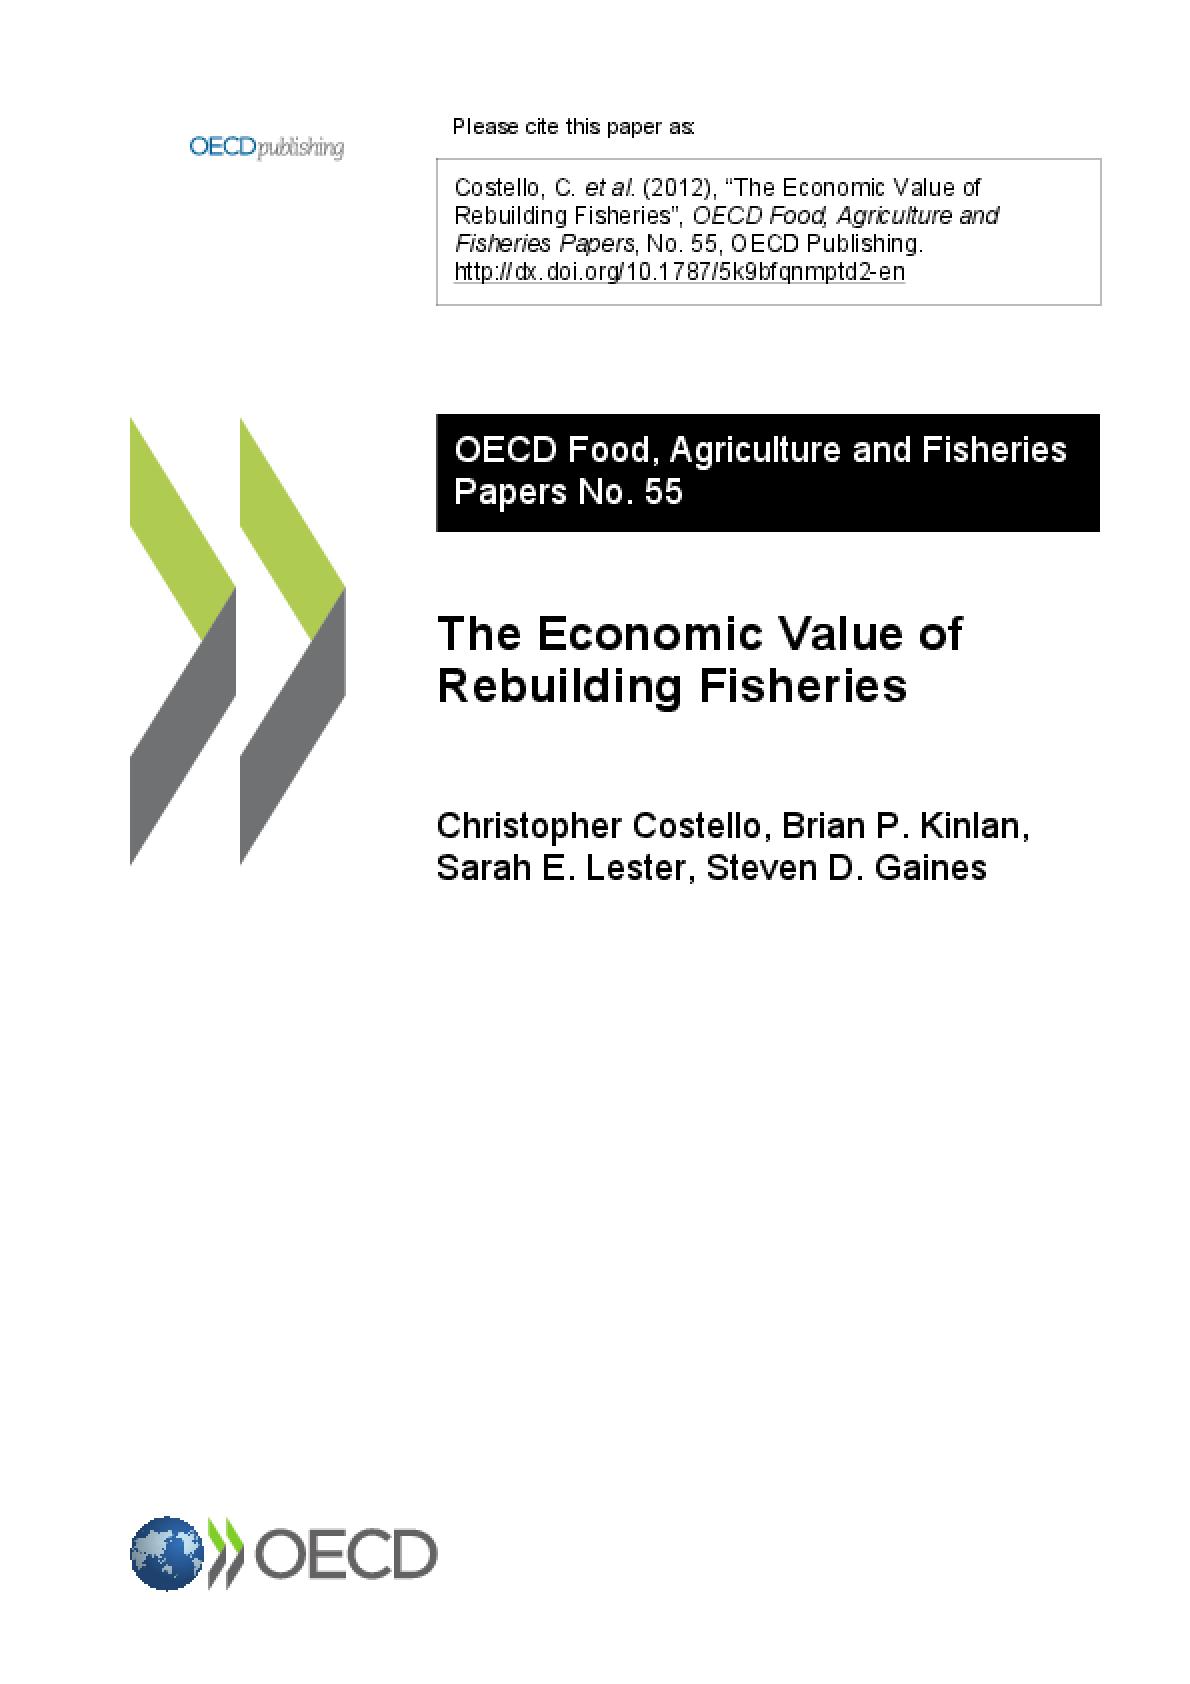 The Economic Value of Rebuilding Fisheries